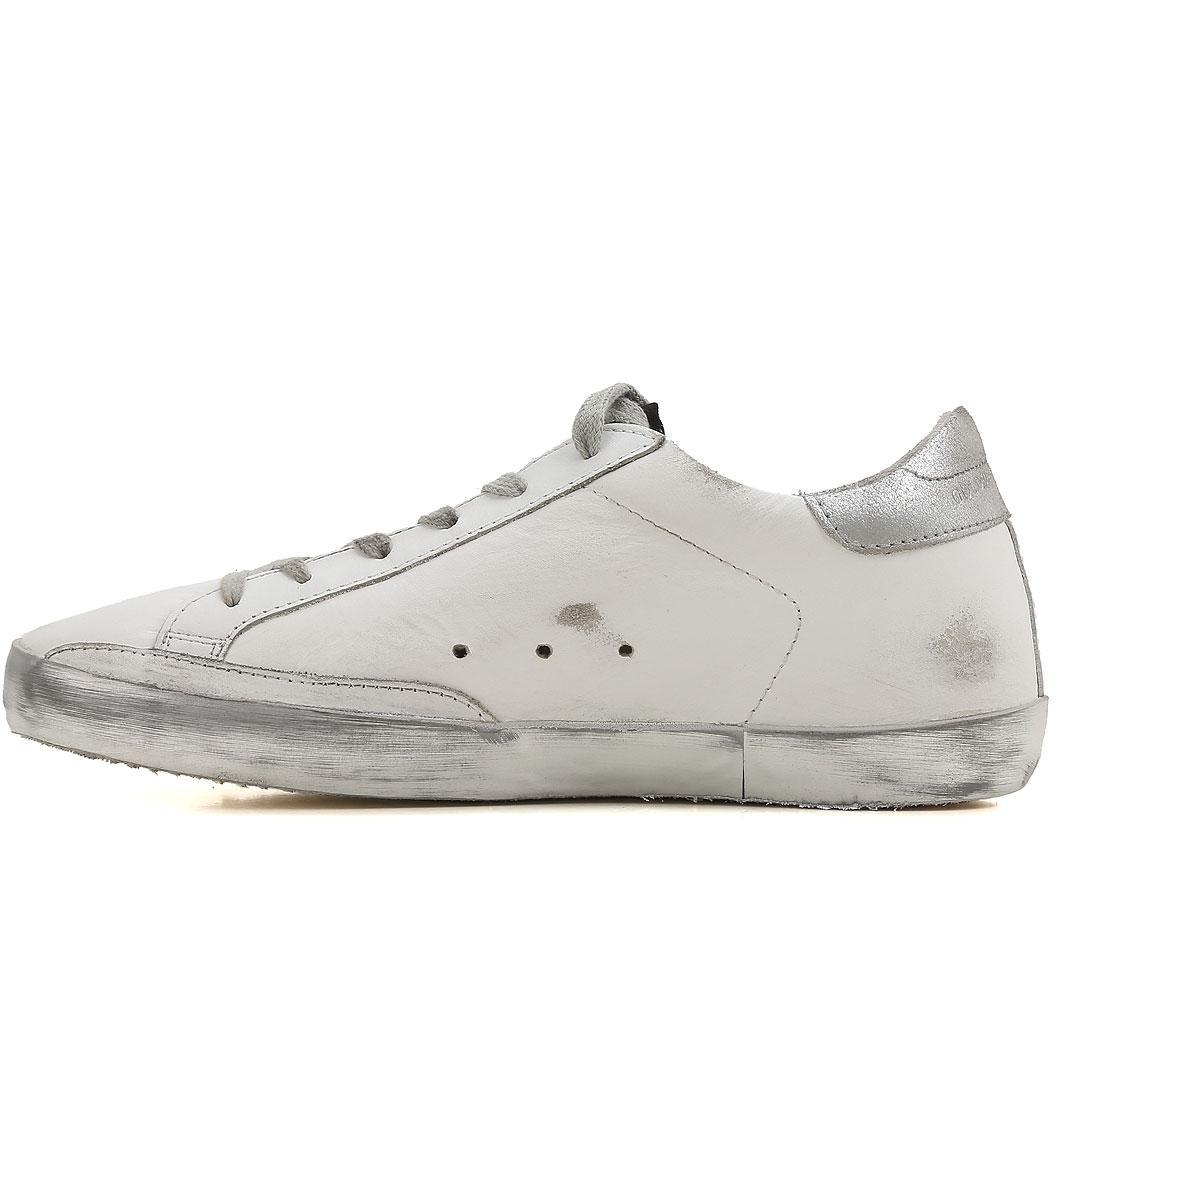 Scarpe Donna Sneakers Golden Goose Offerte Limitate